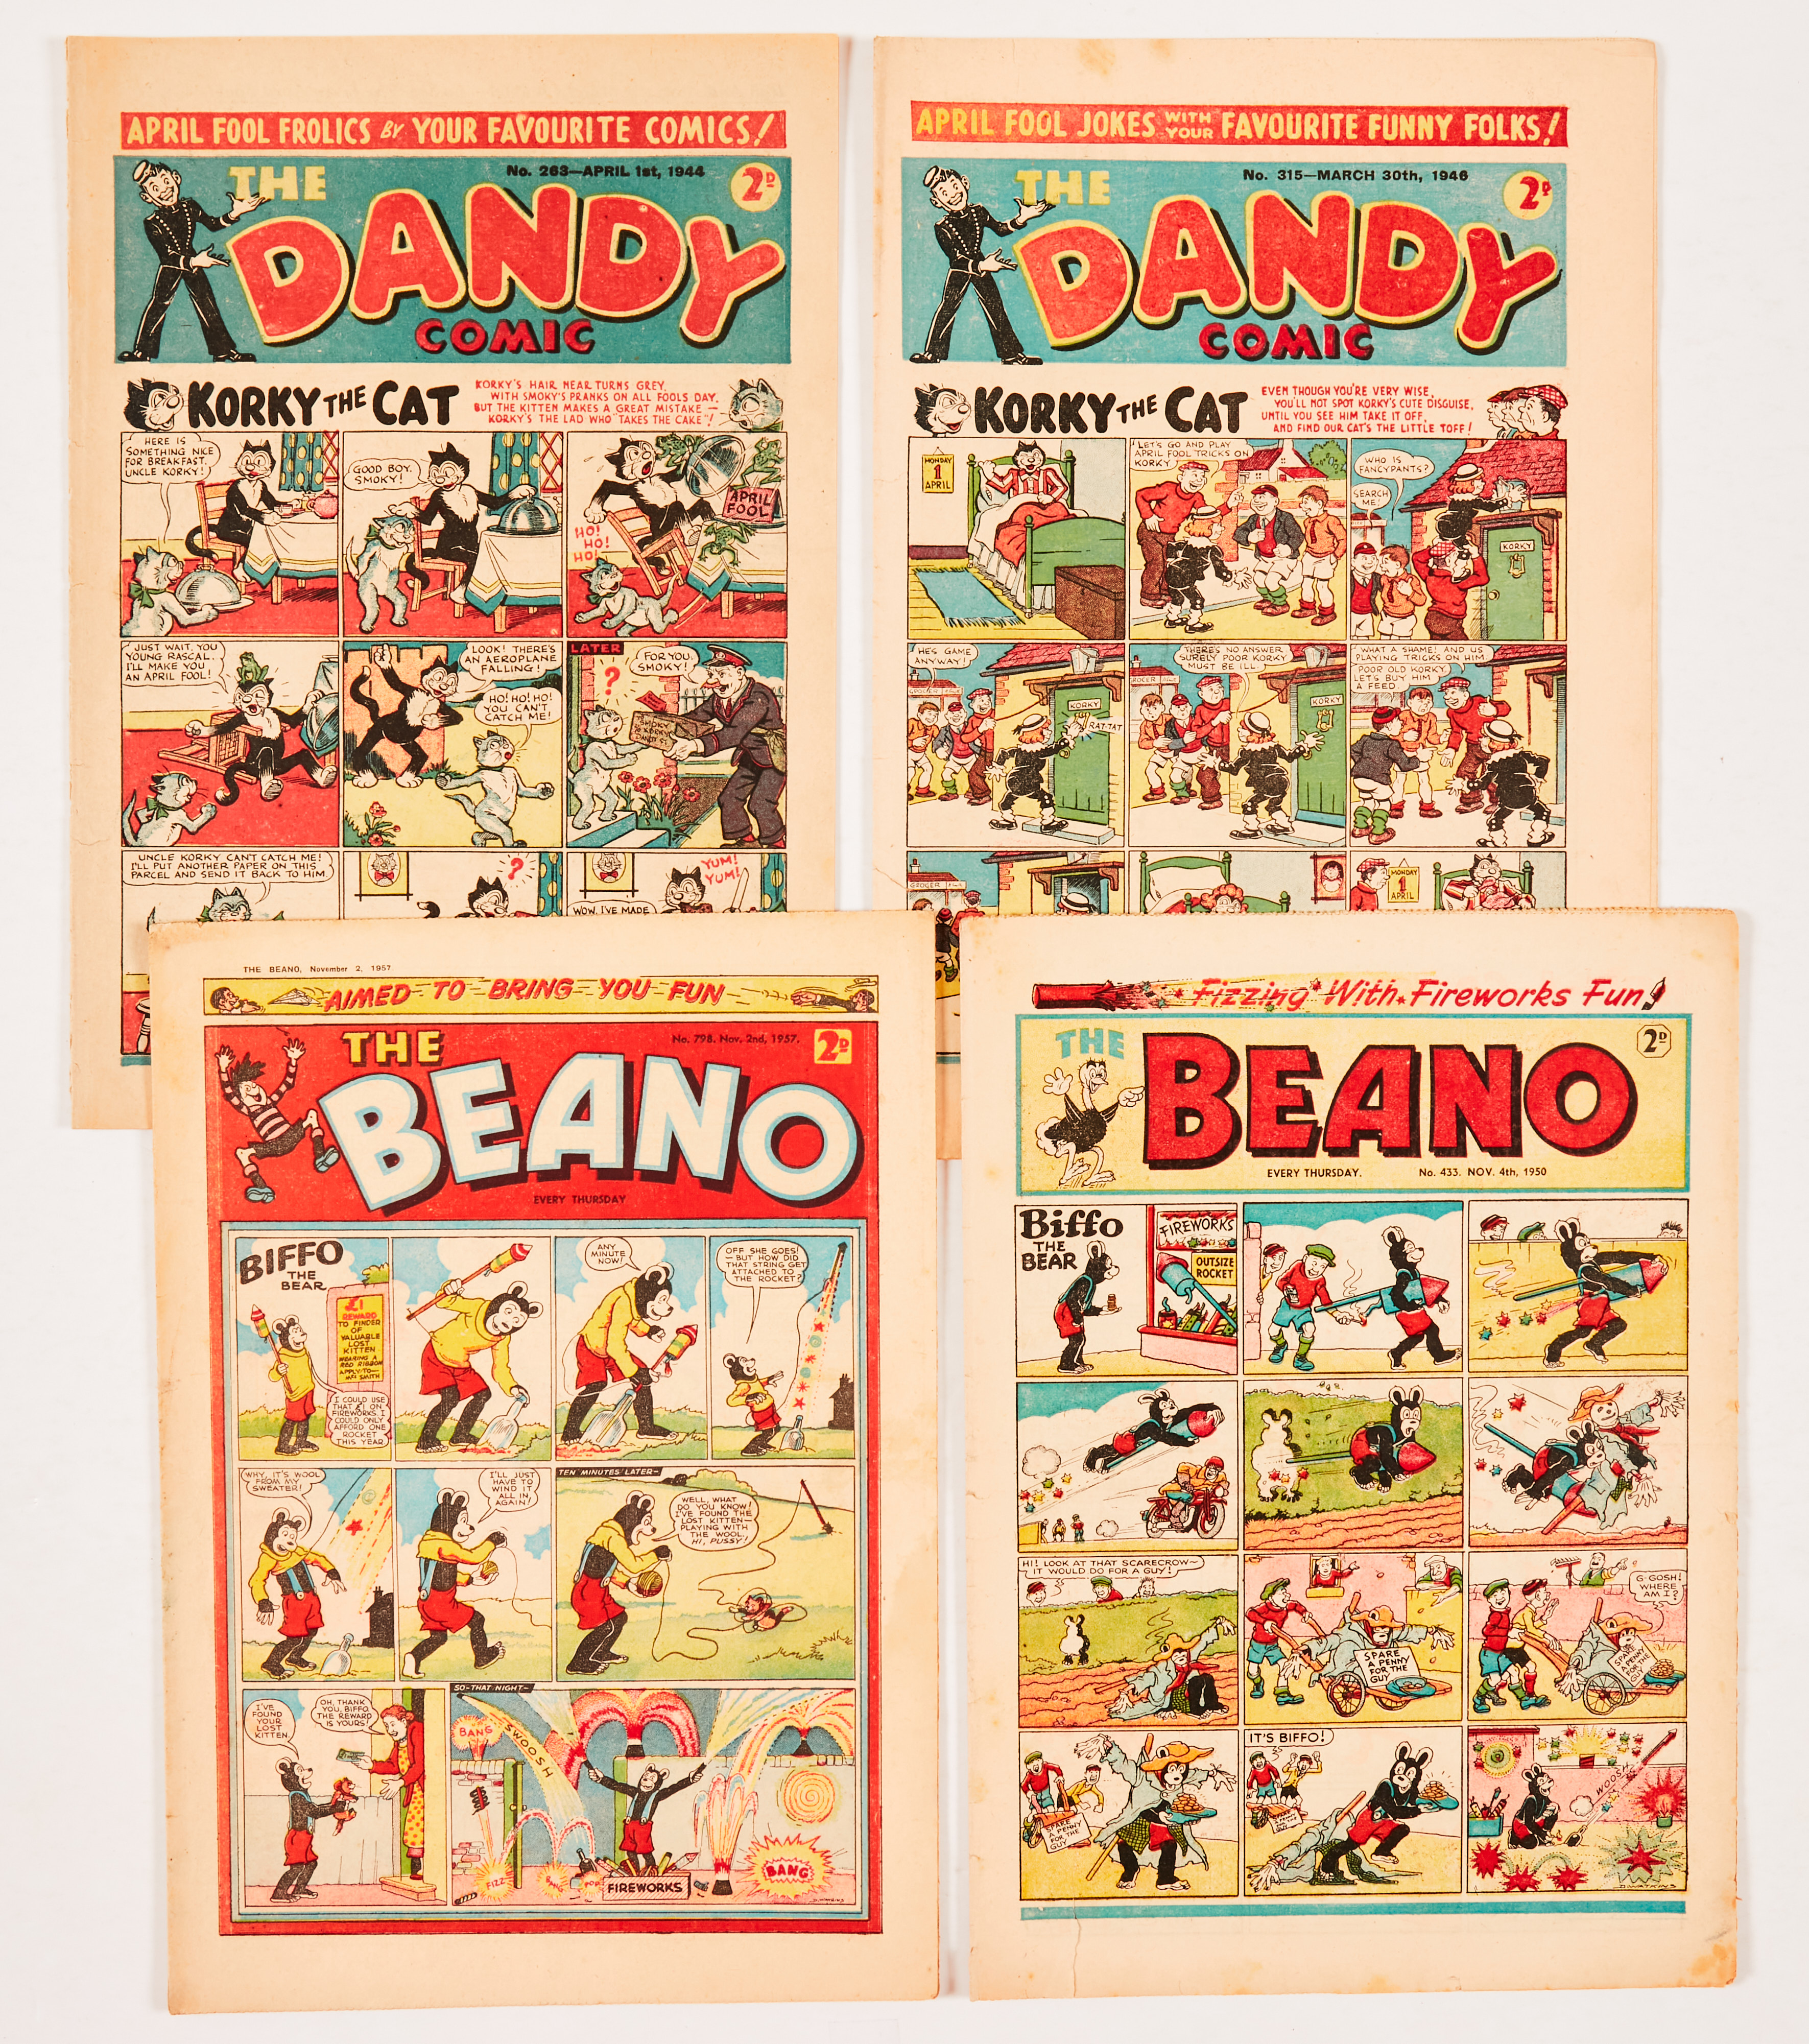 Dandy and Beano Special Issues (1944-57). Dandy No 263 April Fool 1944, No 315 April Fool 1946